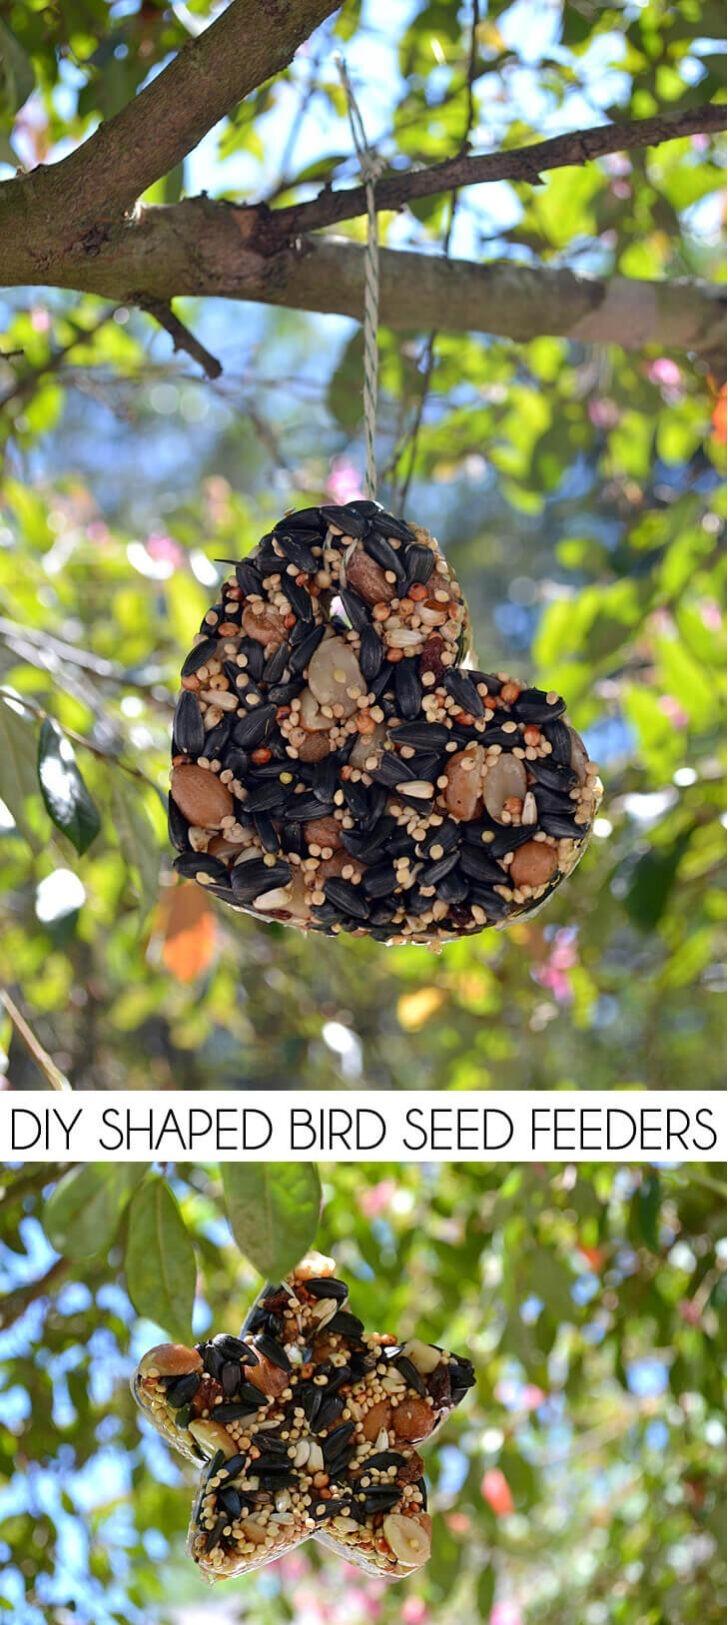 http://www.dreamalittlebigger.com/wp-content/uploads/2015/10/dalb-bird-seed-hanging-bird-feeders-dreamalittlebigger-728x1625.jpg